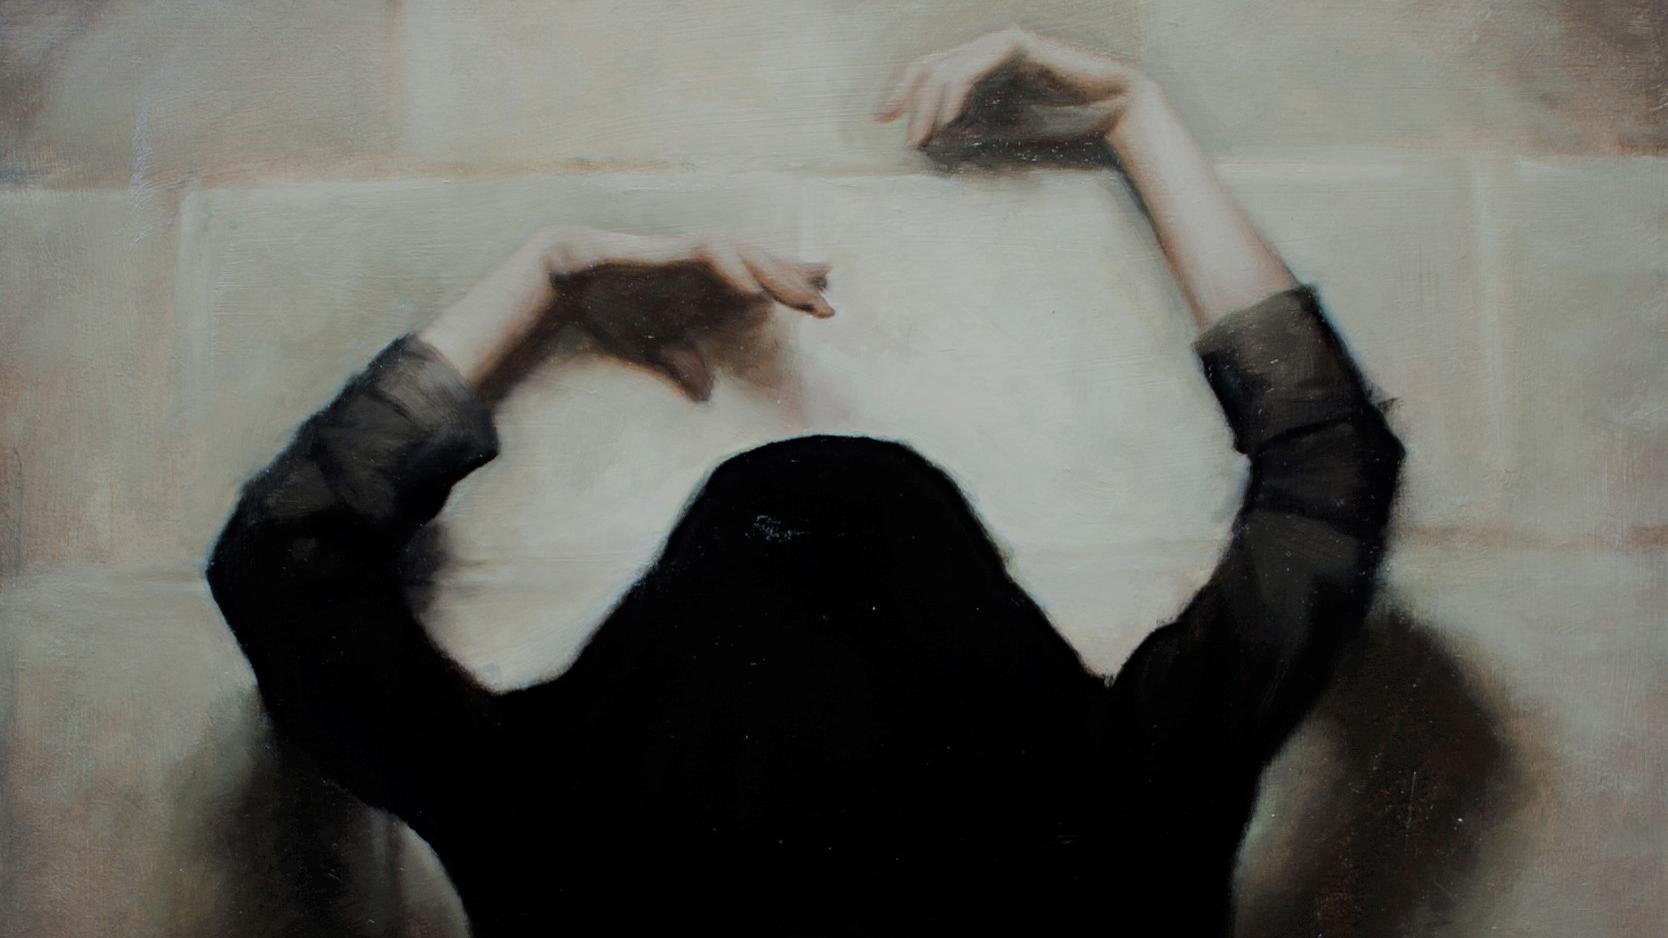 'Obscure' (detail) by Lizet Dingemans